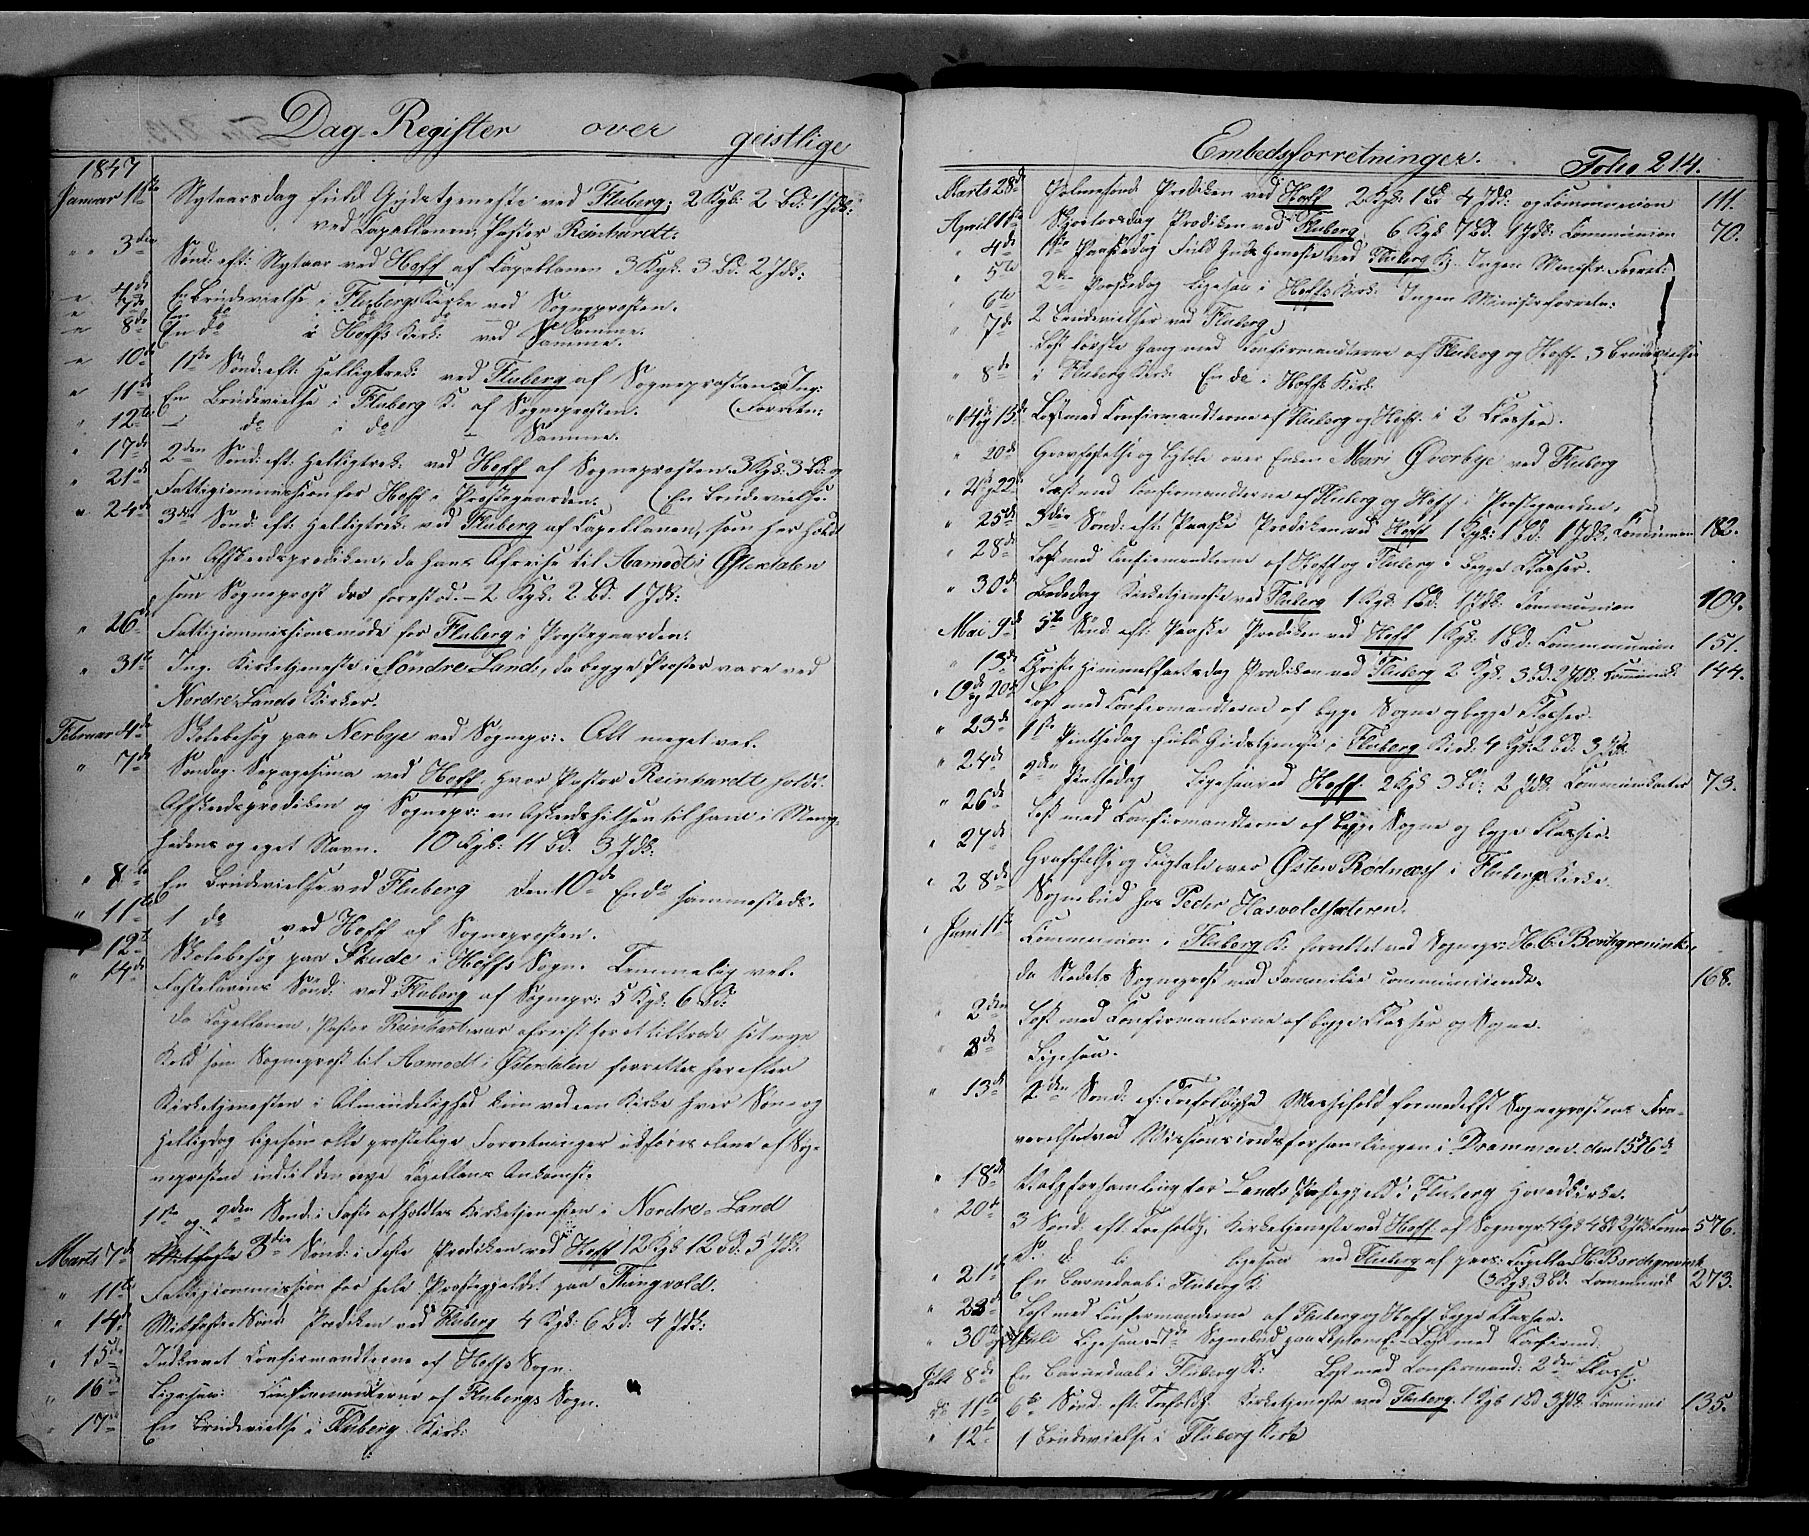 SAH, Land prestekontor, Ministerialbok nr. 9, 1847-1859, s. 214